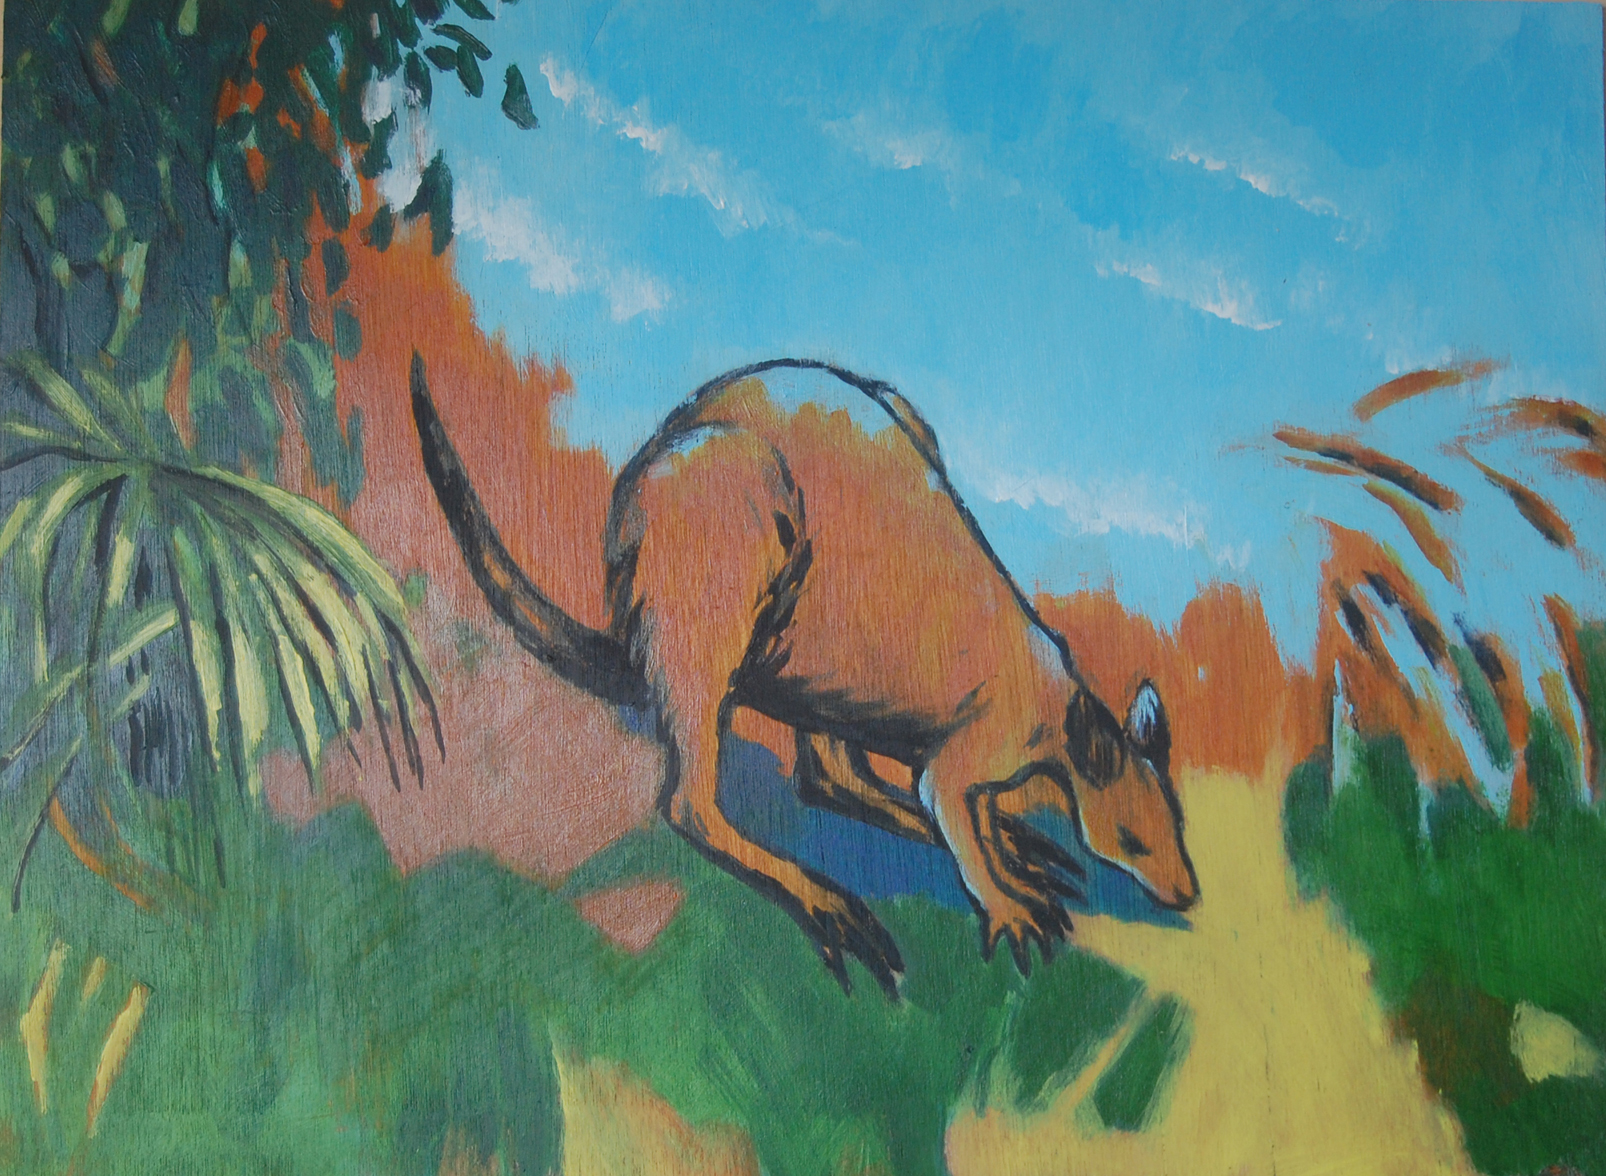 Era wallaby